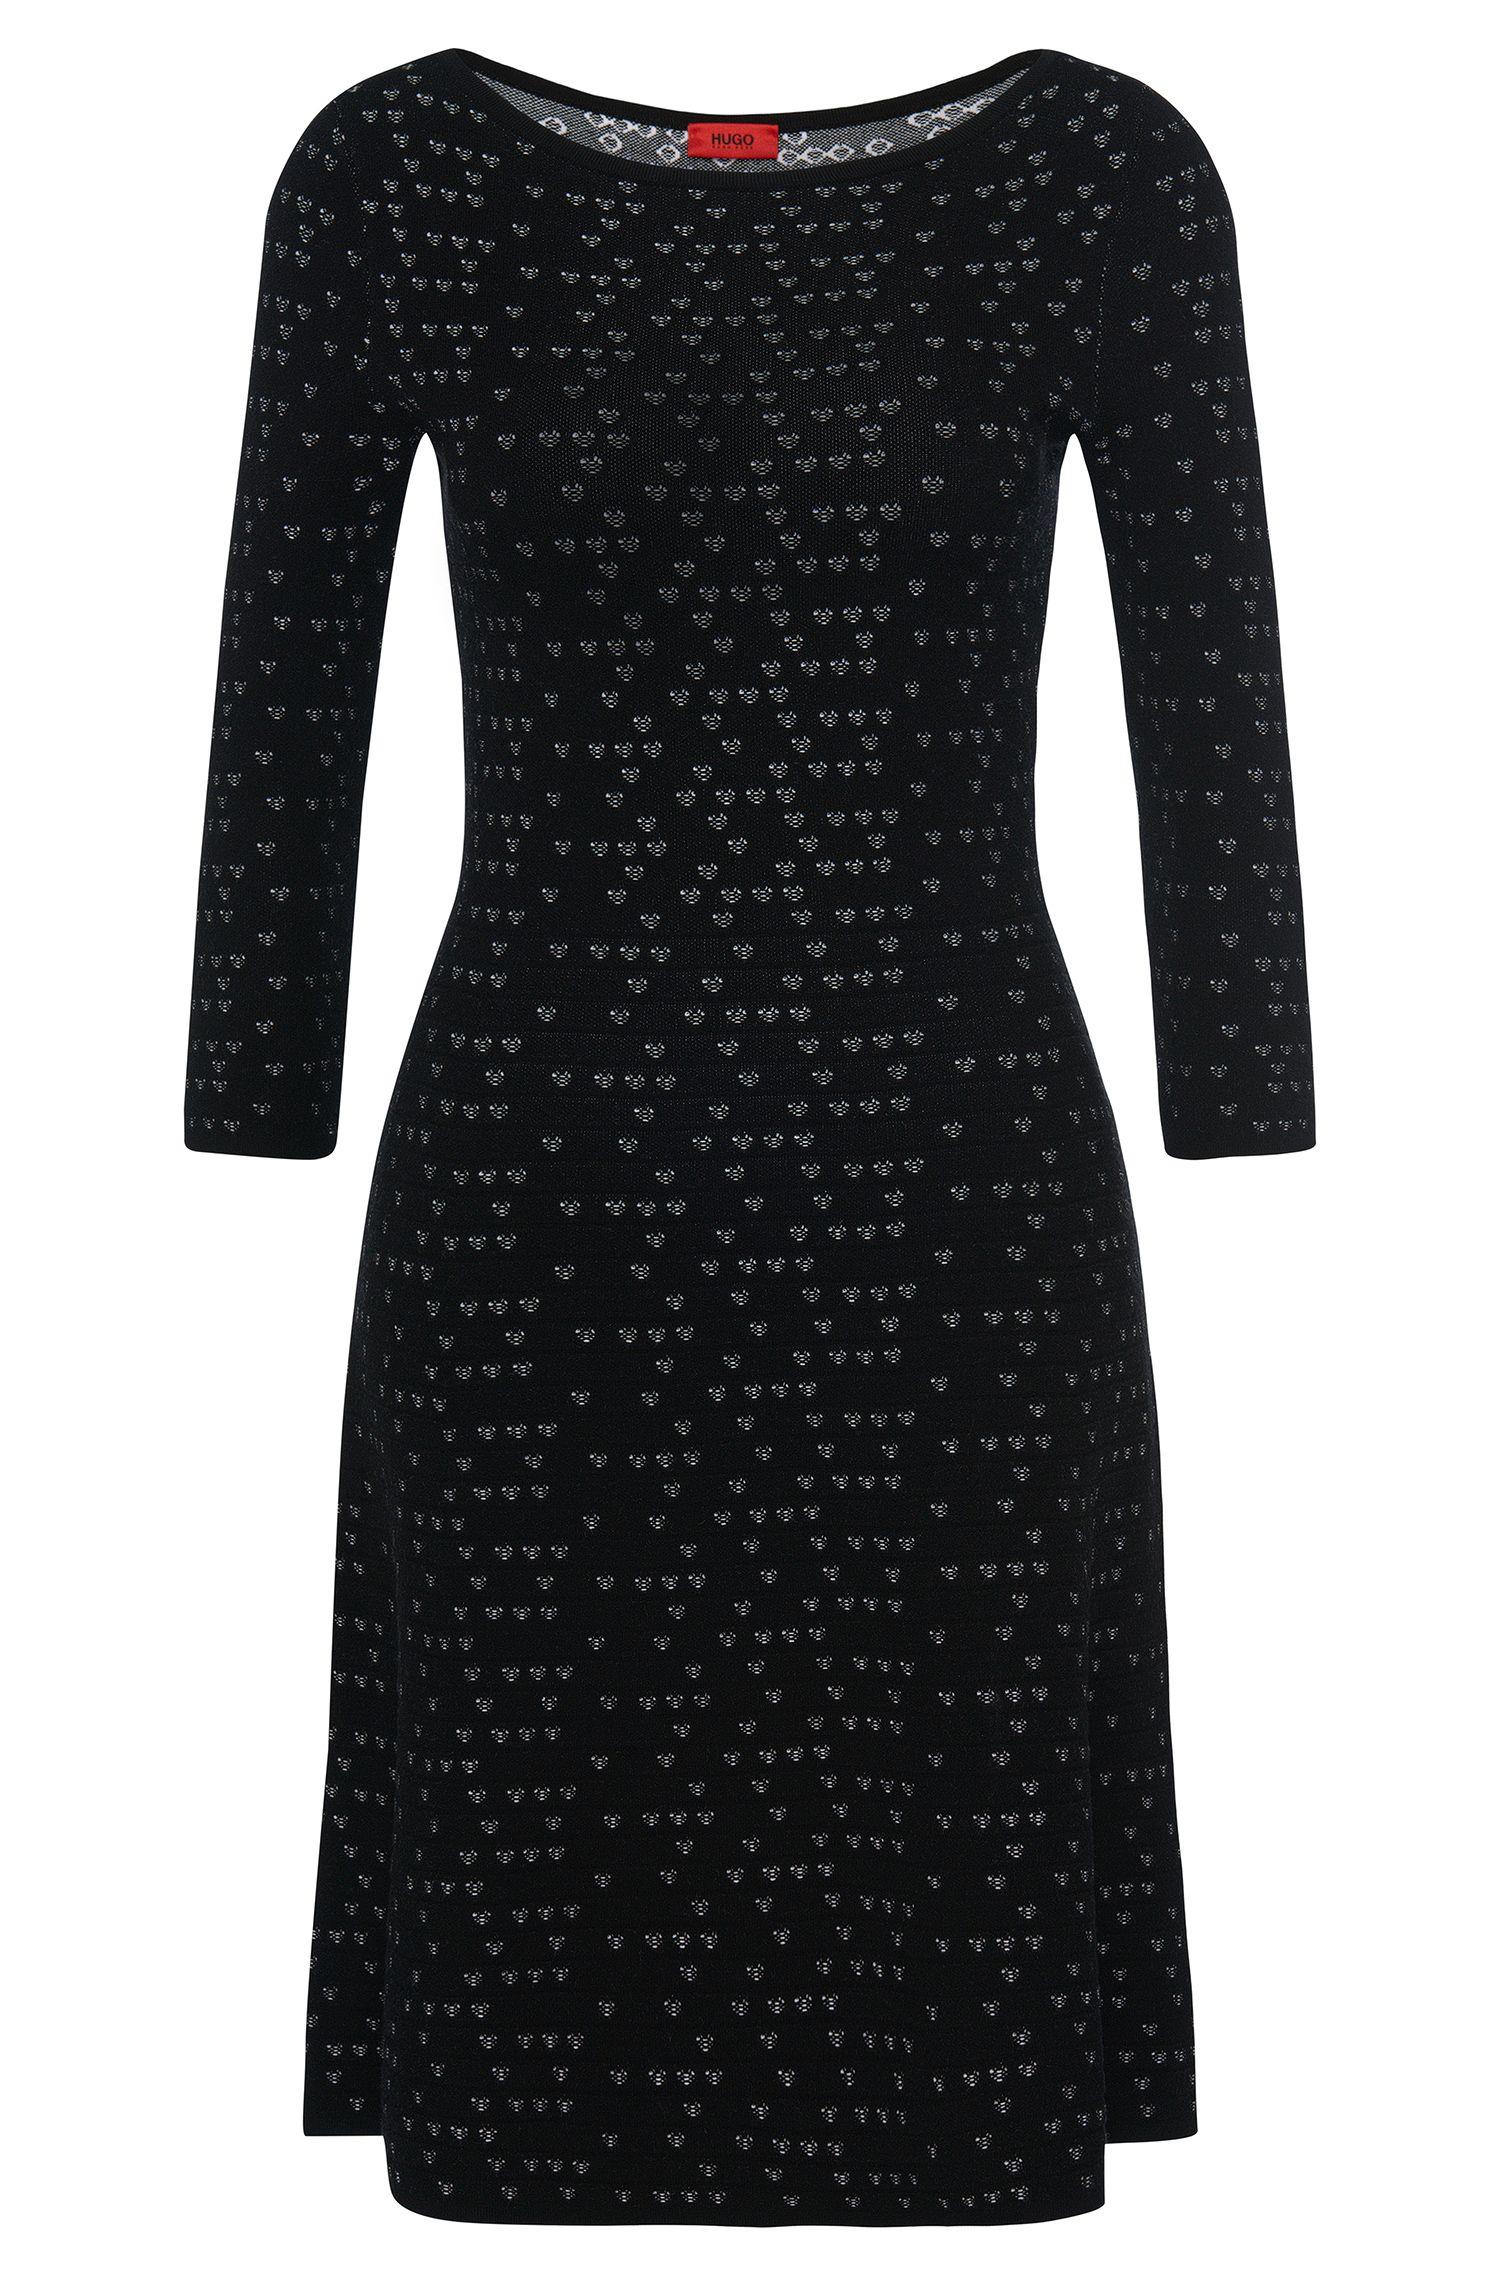 'Serita' | Viscose Patterned Knit Dress